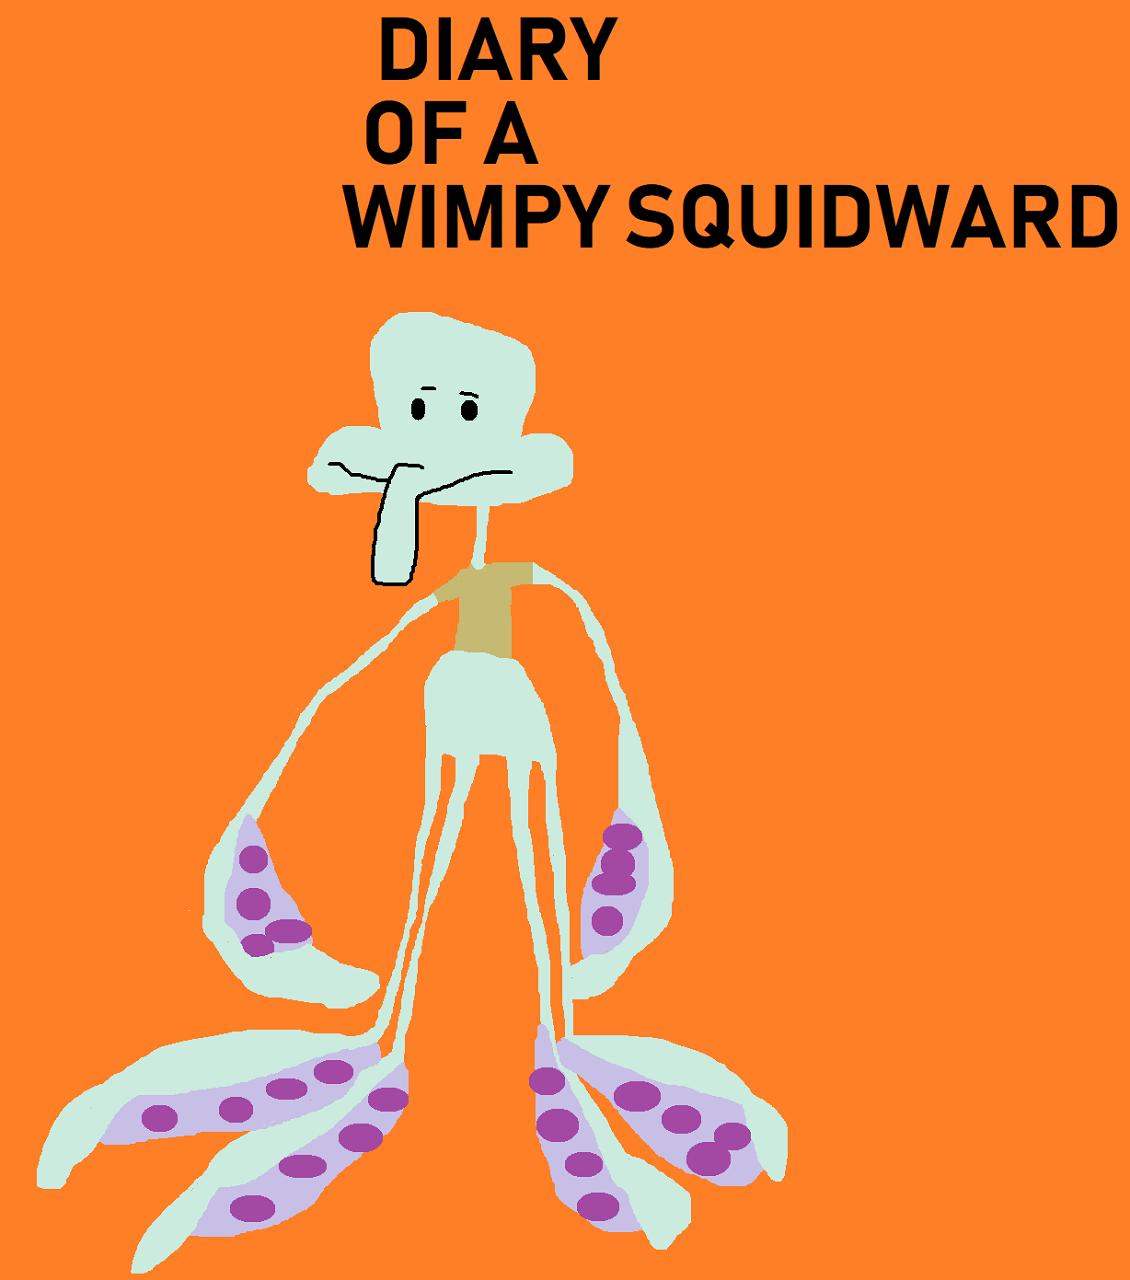 DIARY OF A WIMPY SQUIDWARD by Falconlobo